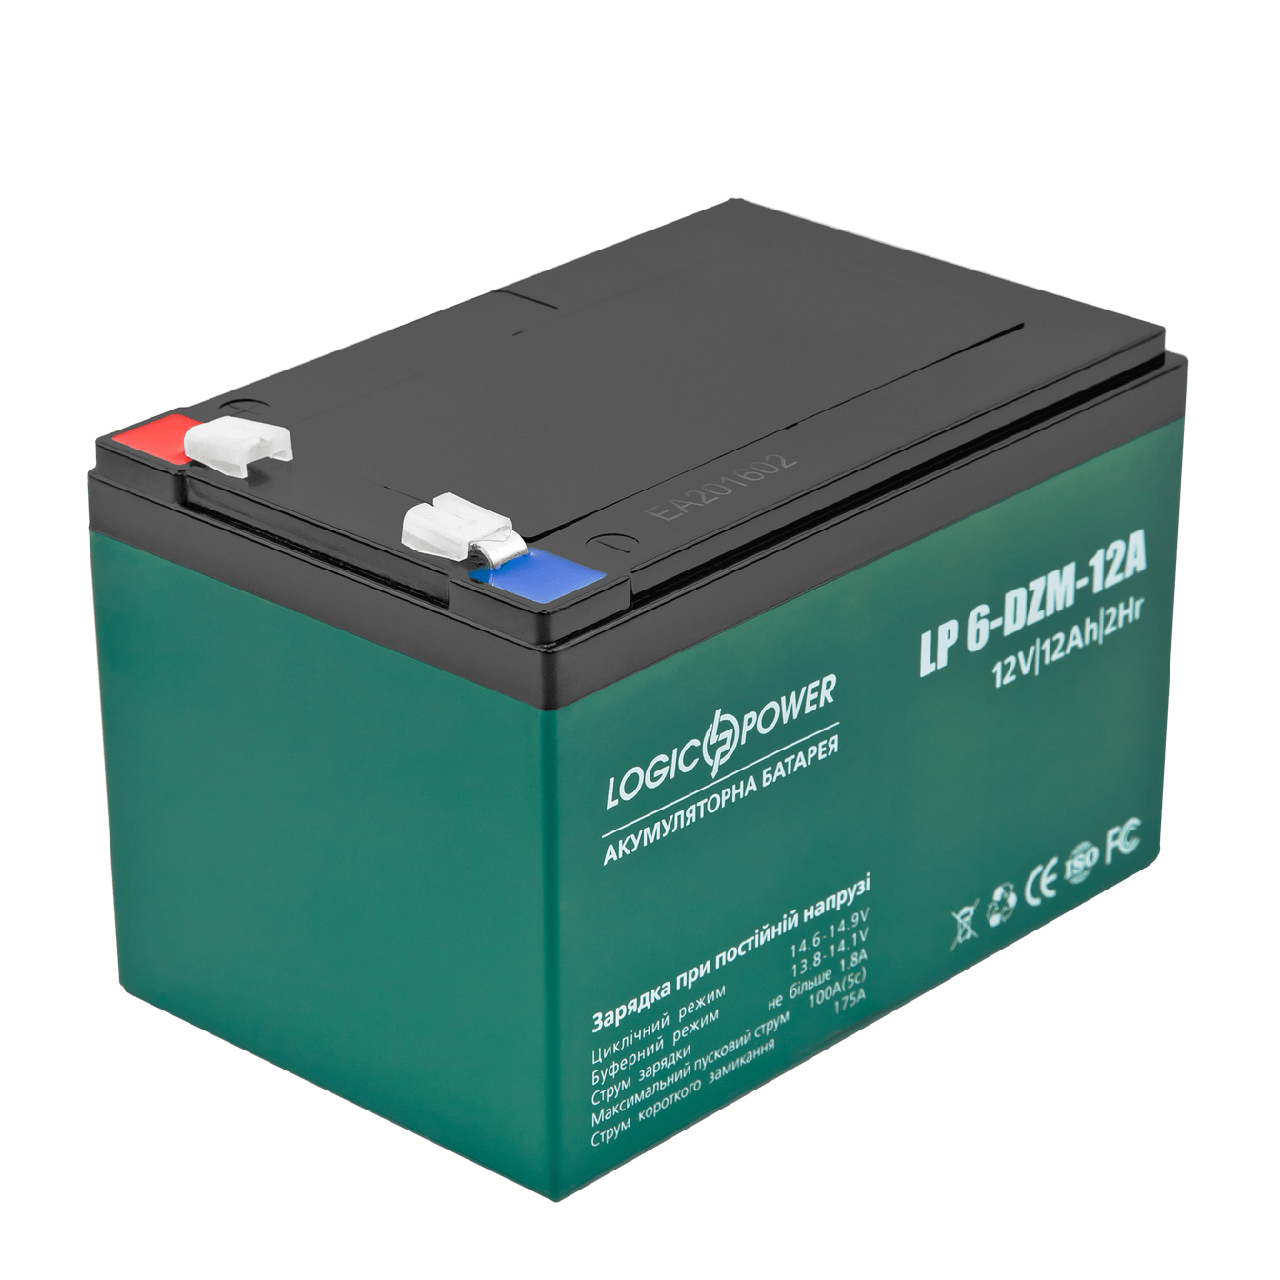 Тяговый аккумулятор AGM LogicPower LP 6-DZM-12 (12В, 12Ач), клемма F2